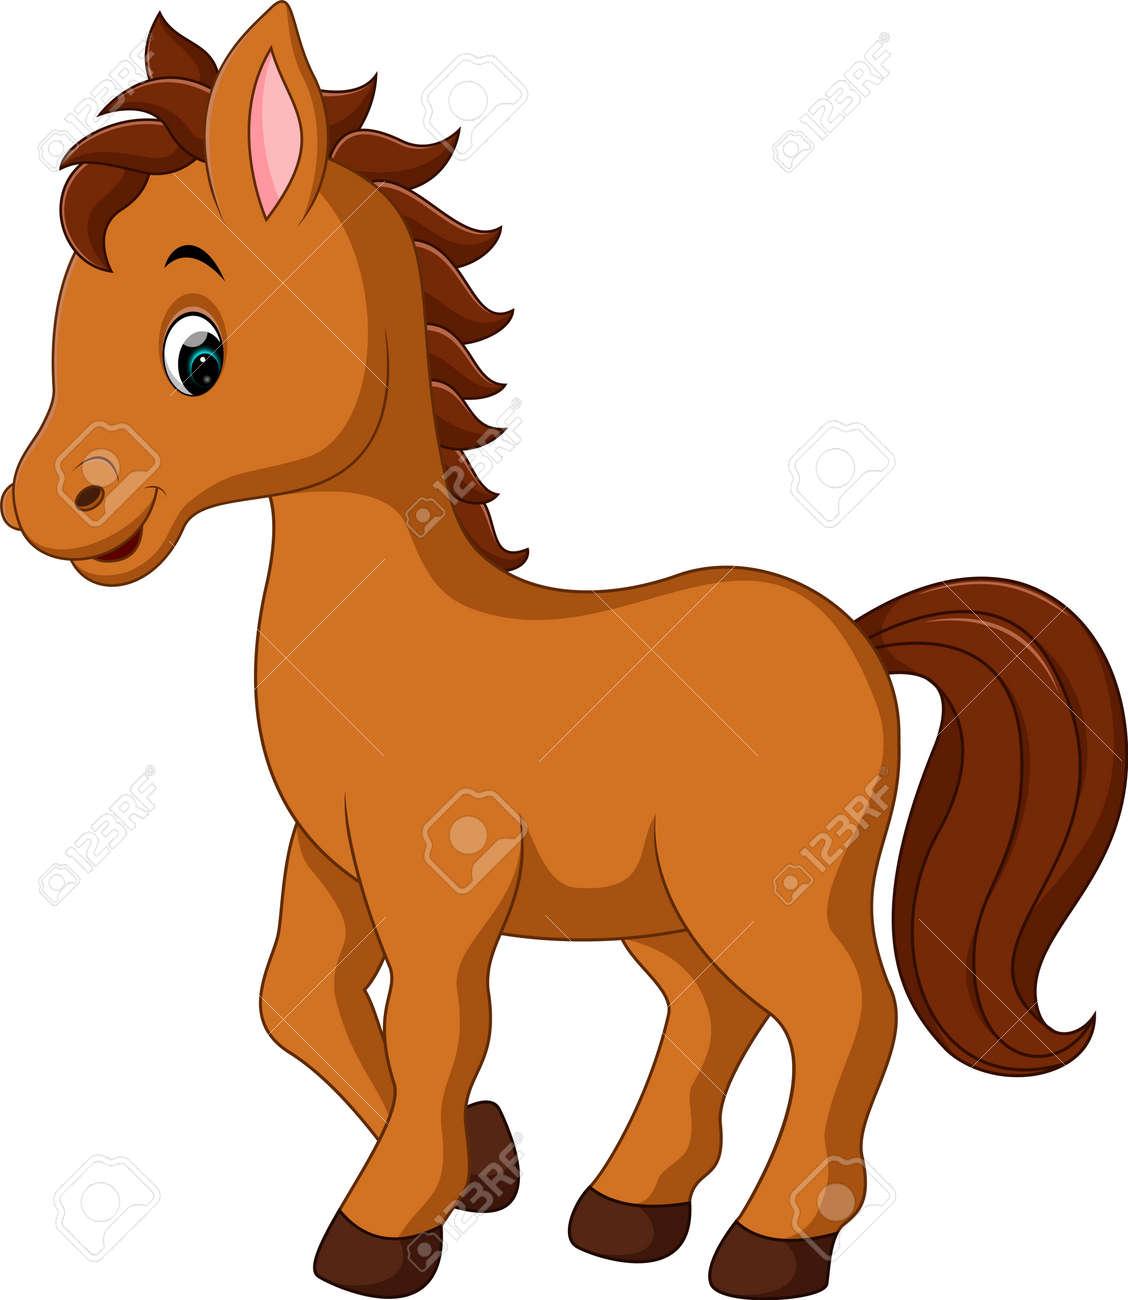 cute horse cartoon royalty free cliparts vectors and stock rh 123rf com cute sea horse clipart cute horse clipart free